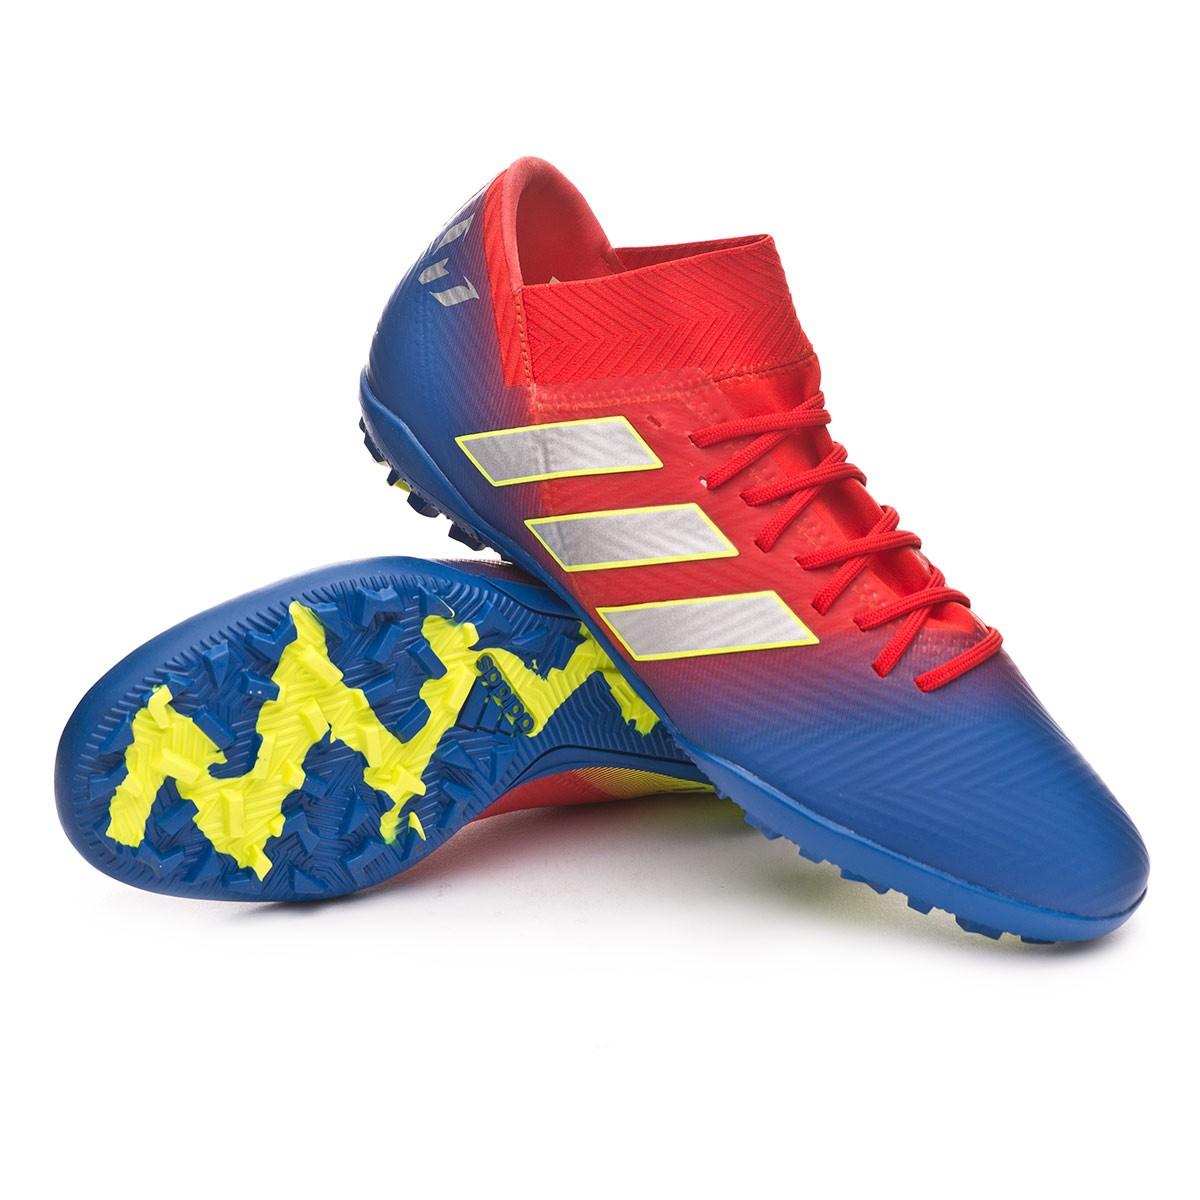 adidas football scarpe red